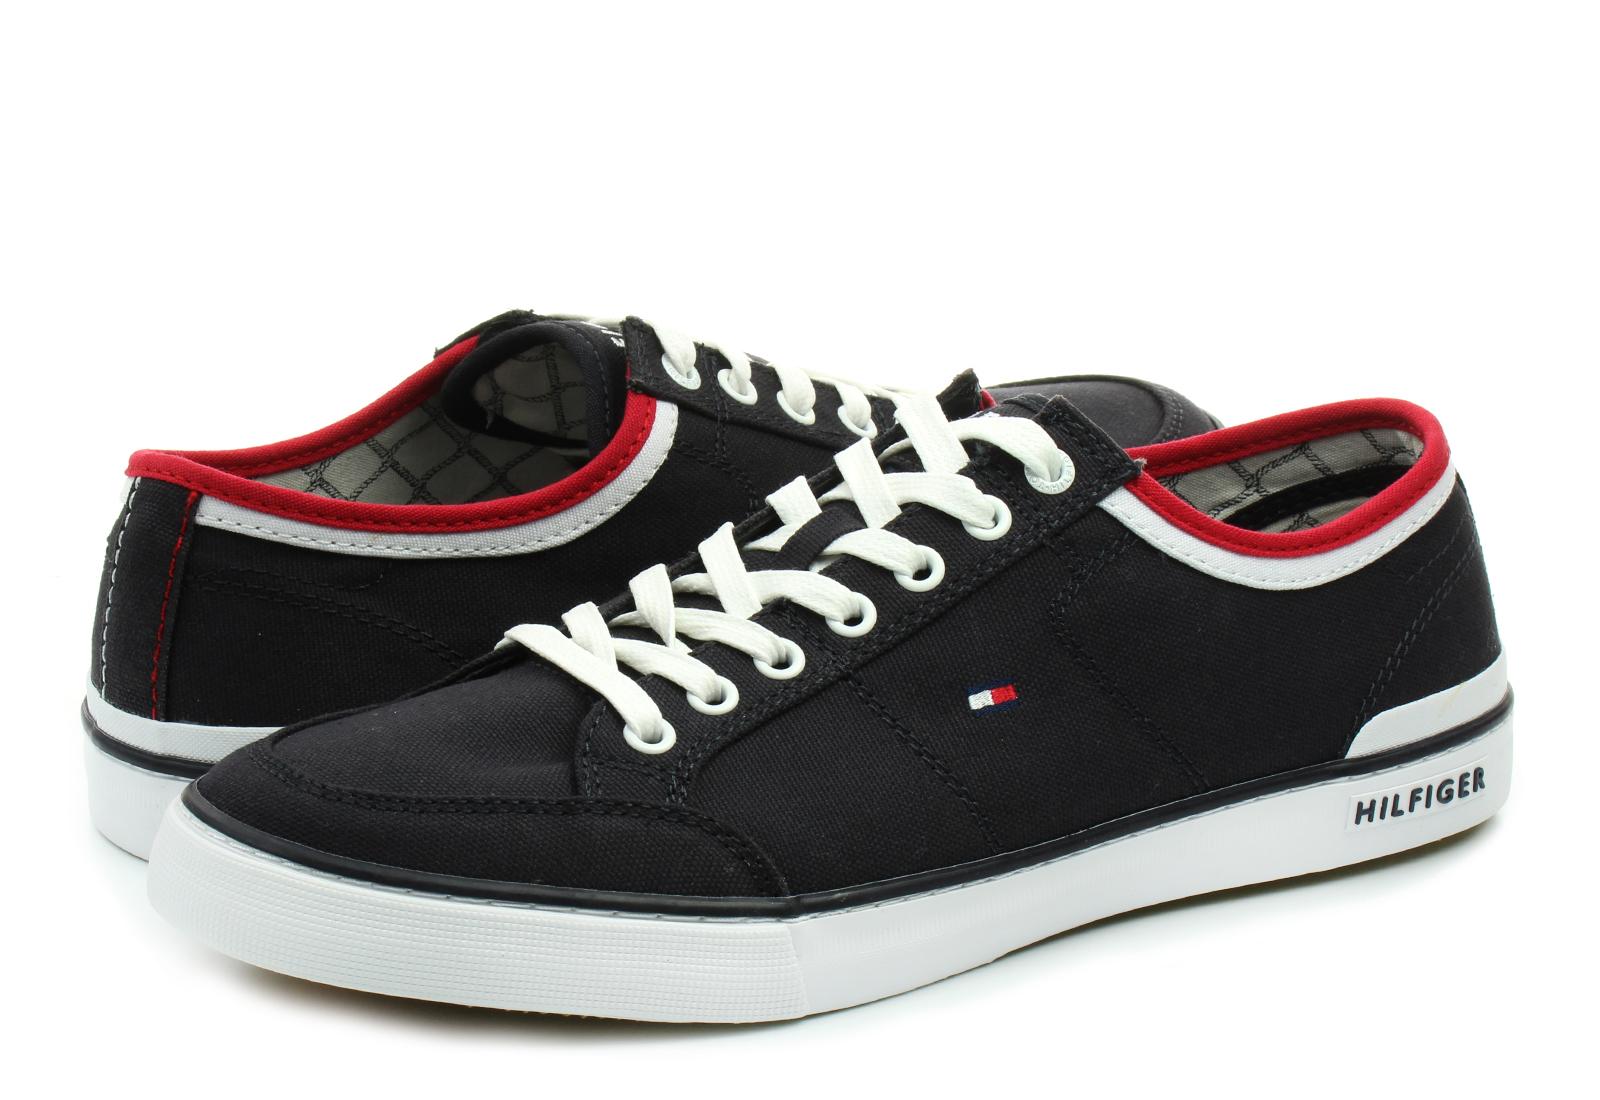 12558afd88 Tommy Hilfiger Cipő - Harrington 5d2 - 17S-0543-403 - Office Shoes ...